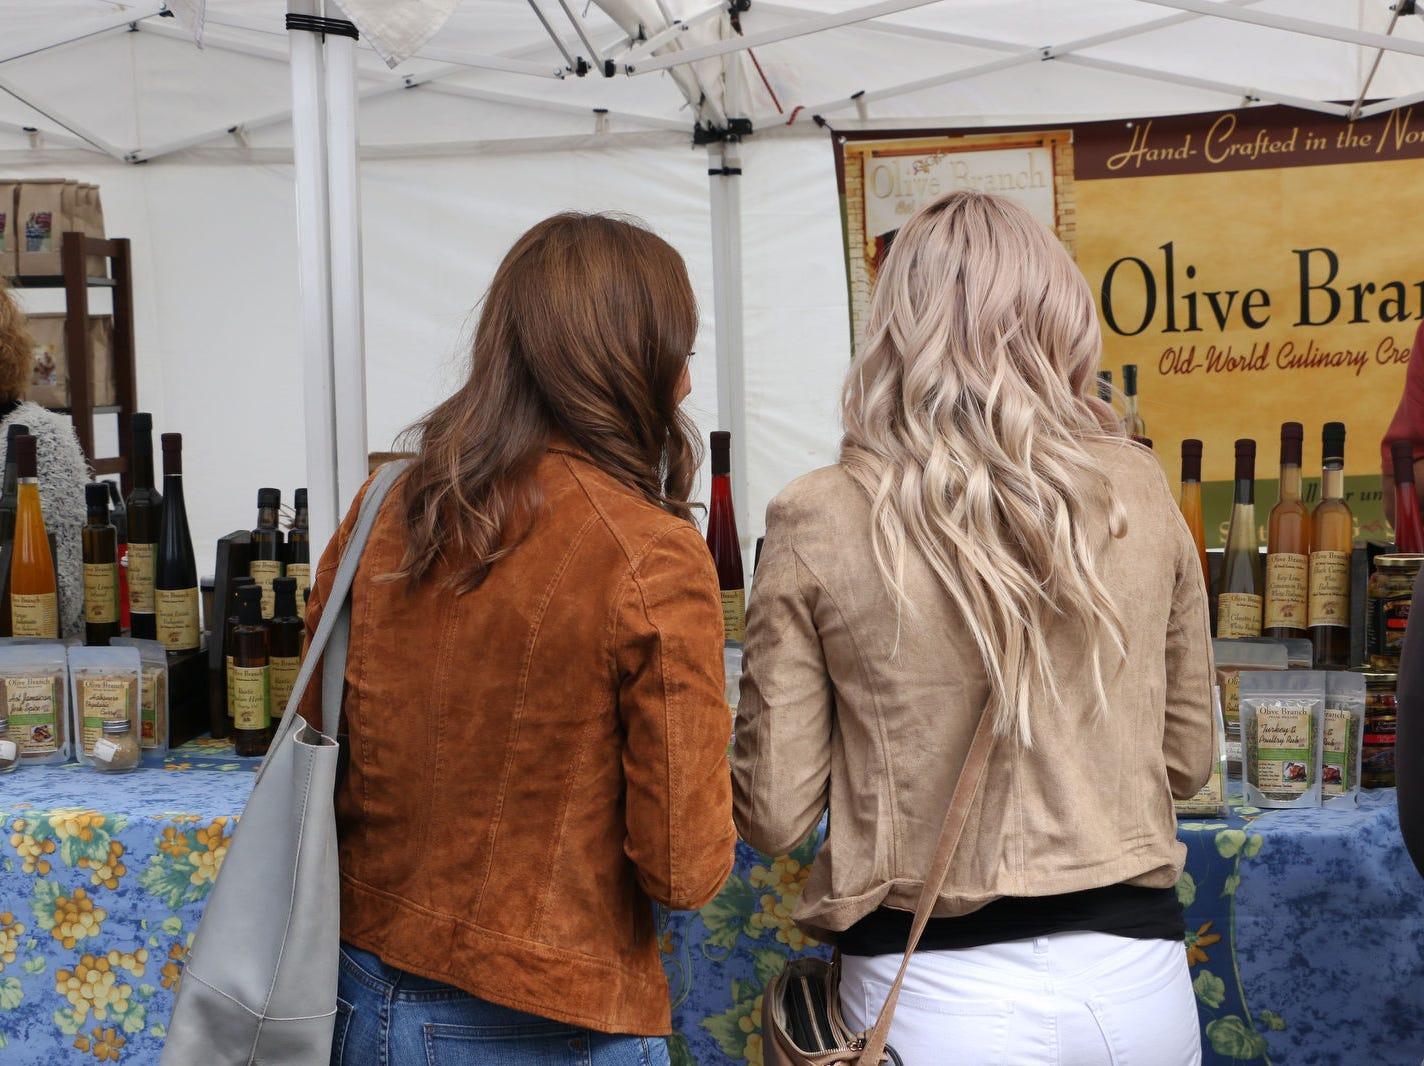 The Eldorado Great Italian Festival in downtown Reno on Oct. 6, 2018.